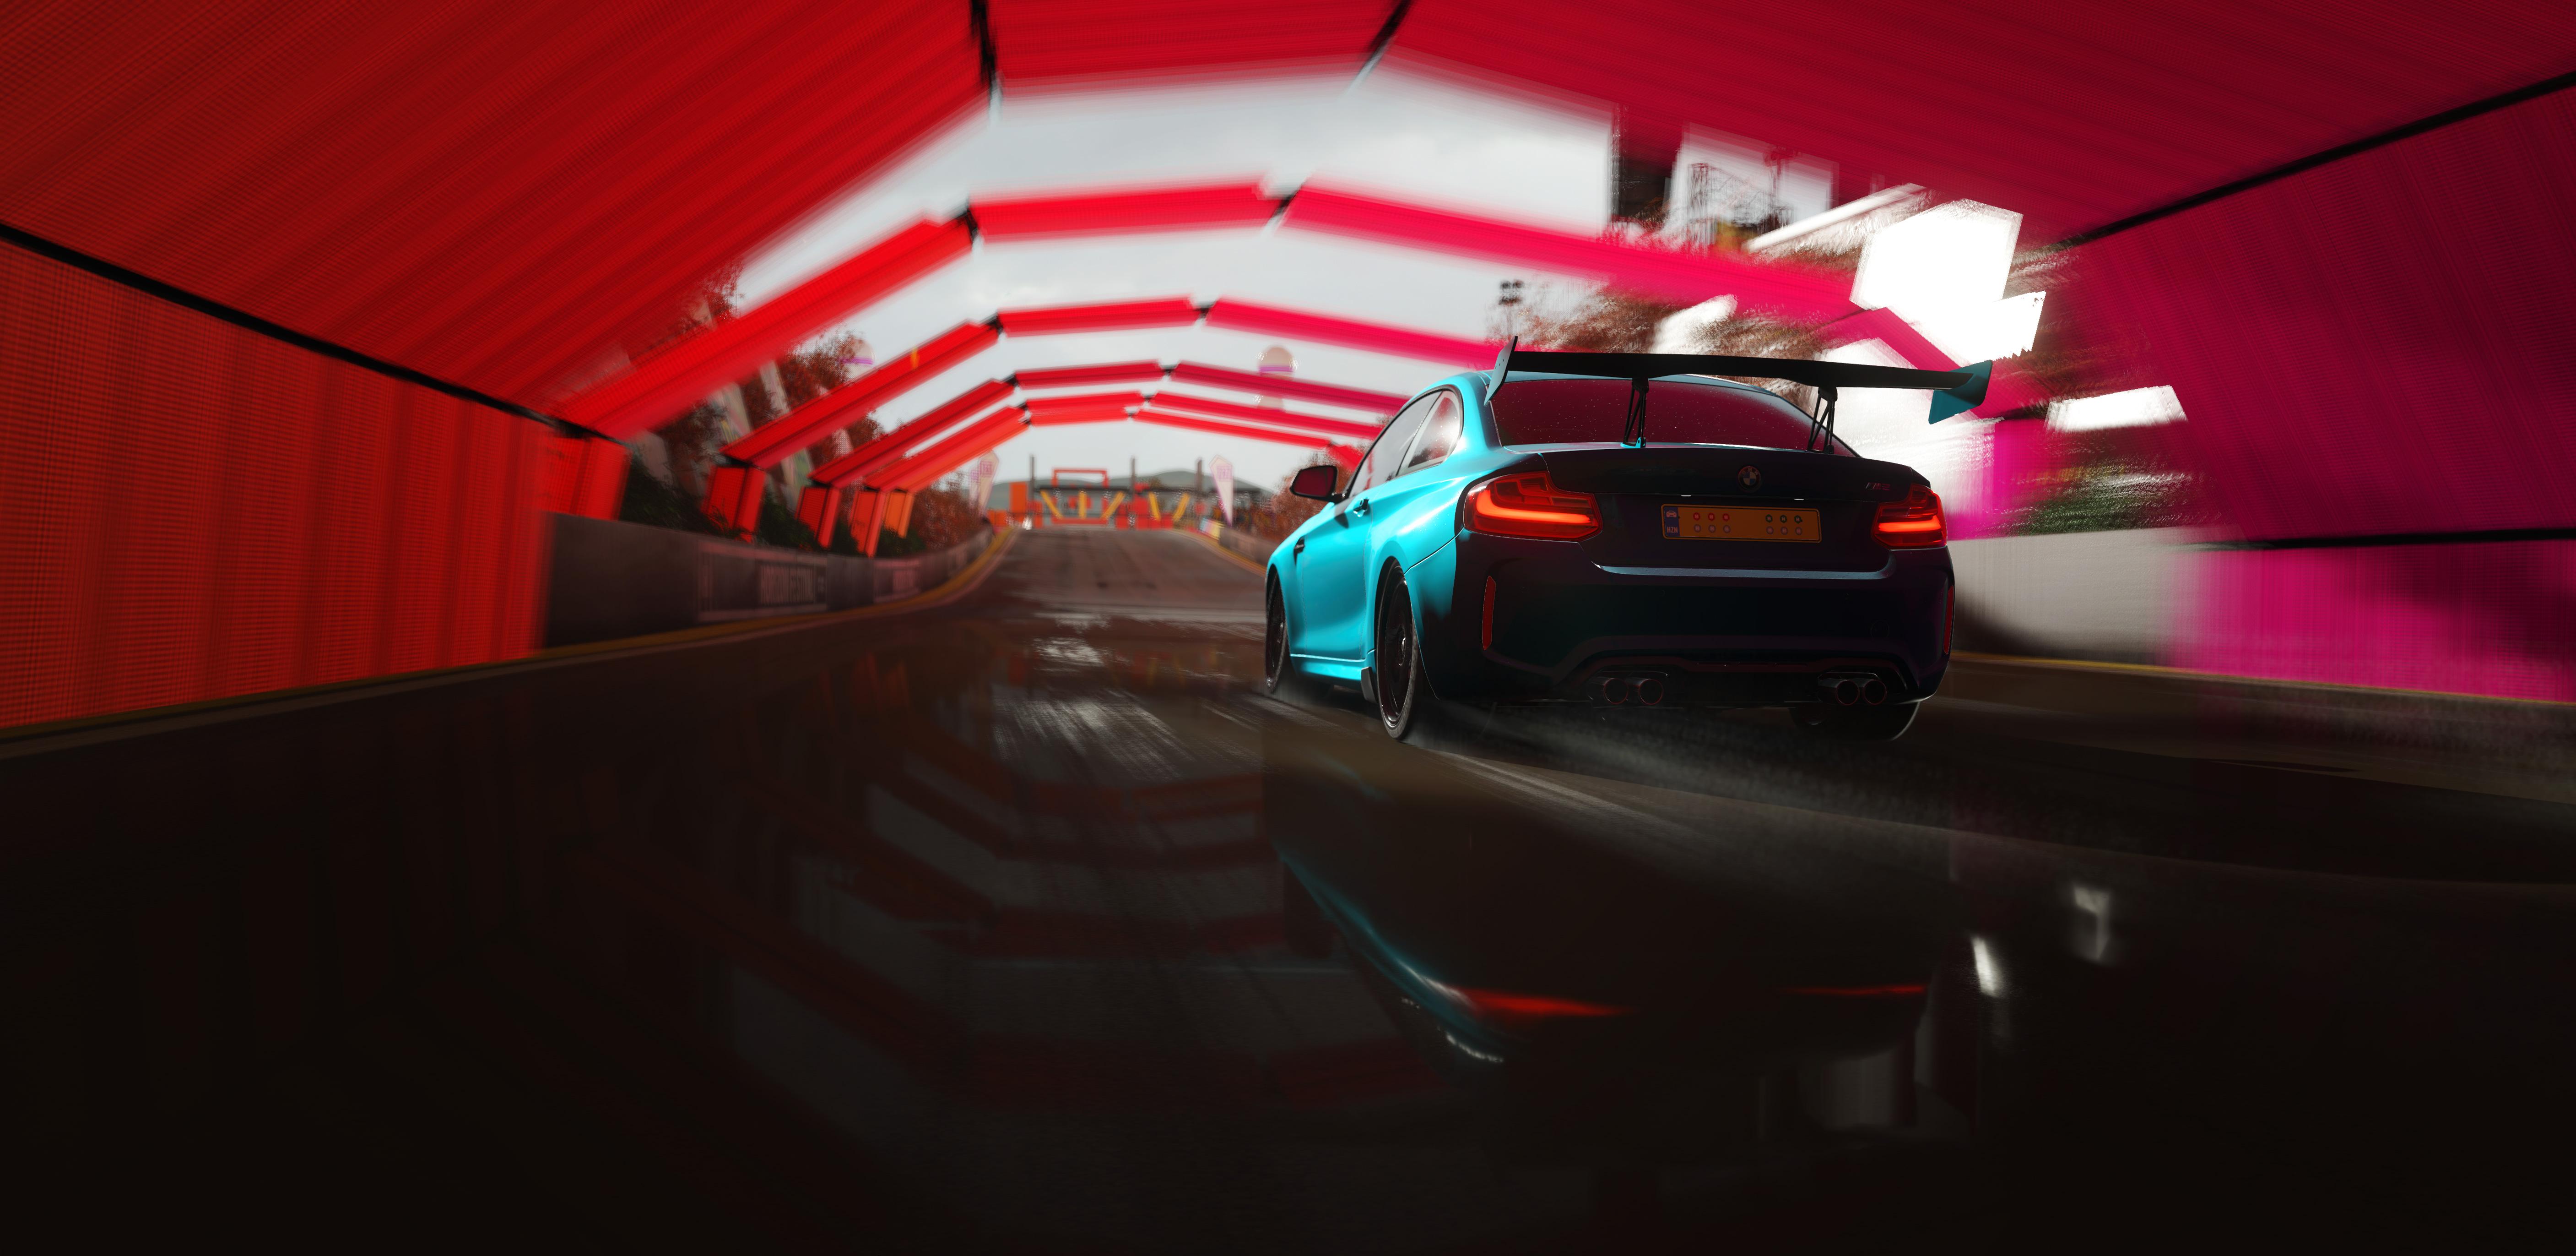 Forza Horizon 4 2019 5k, HD Games, 4k Wallpapers, Images